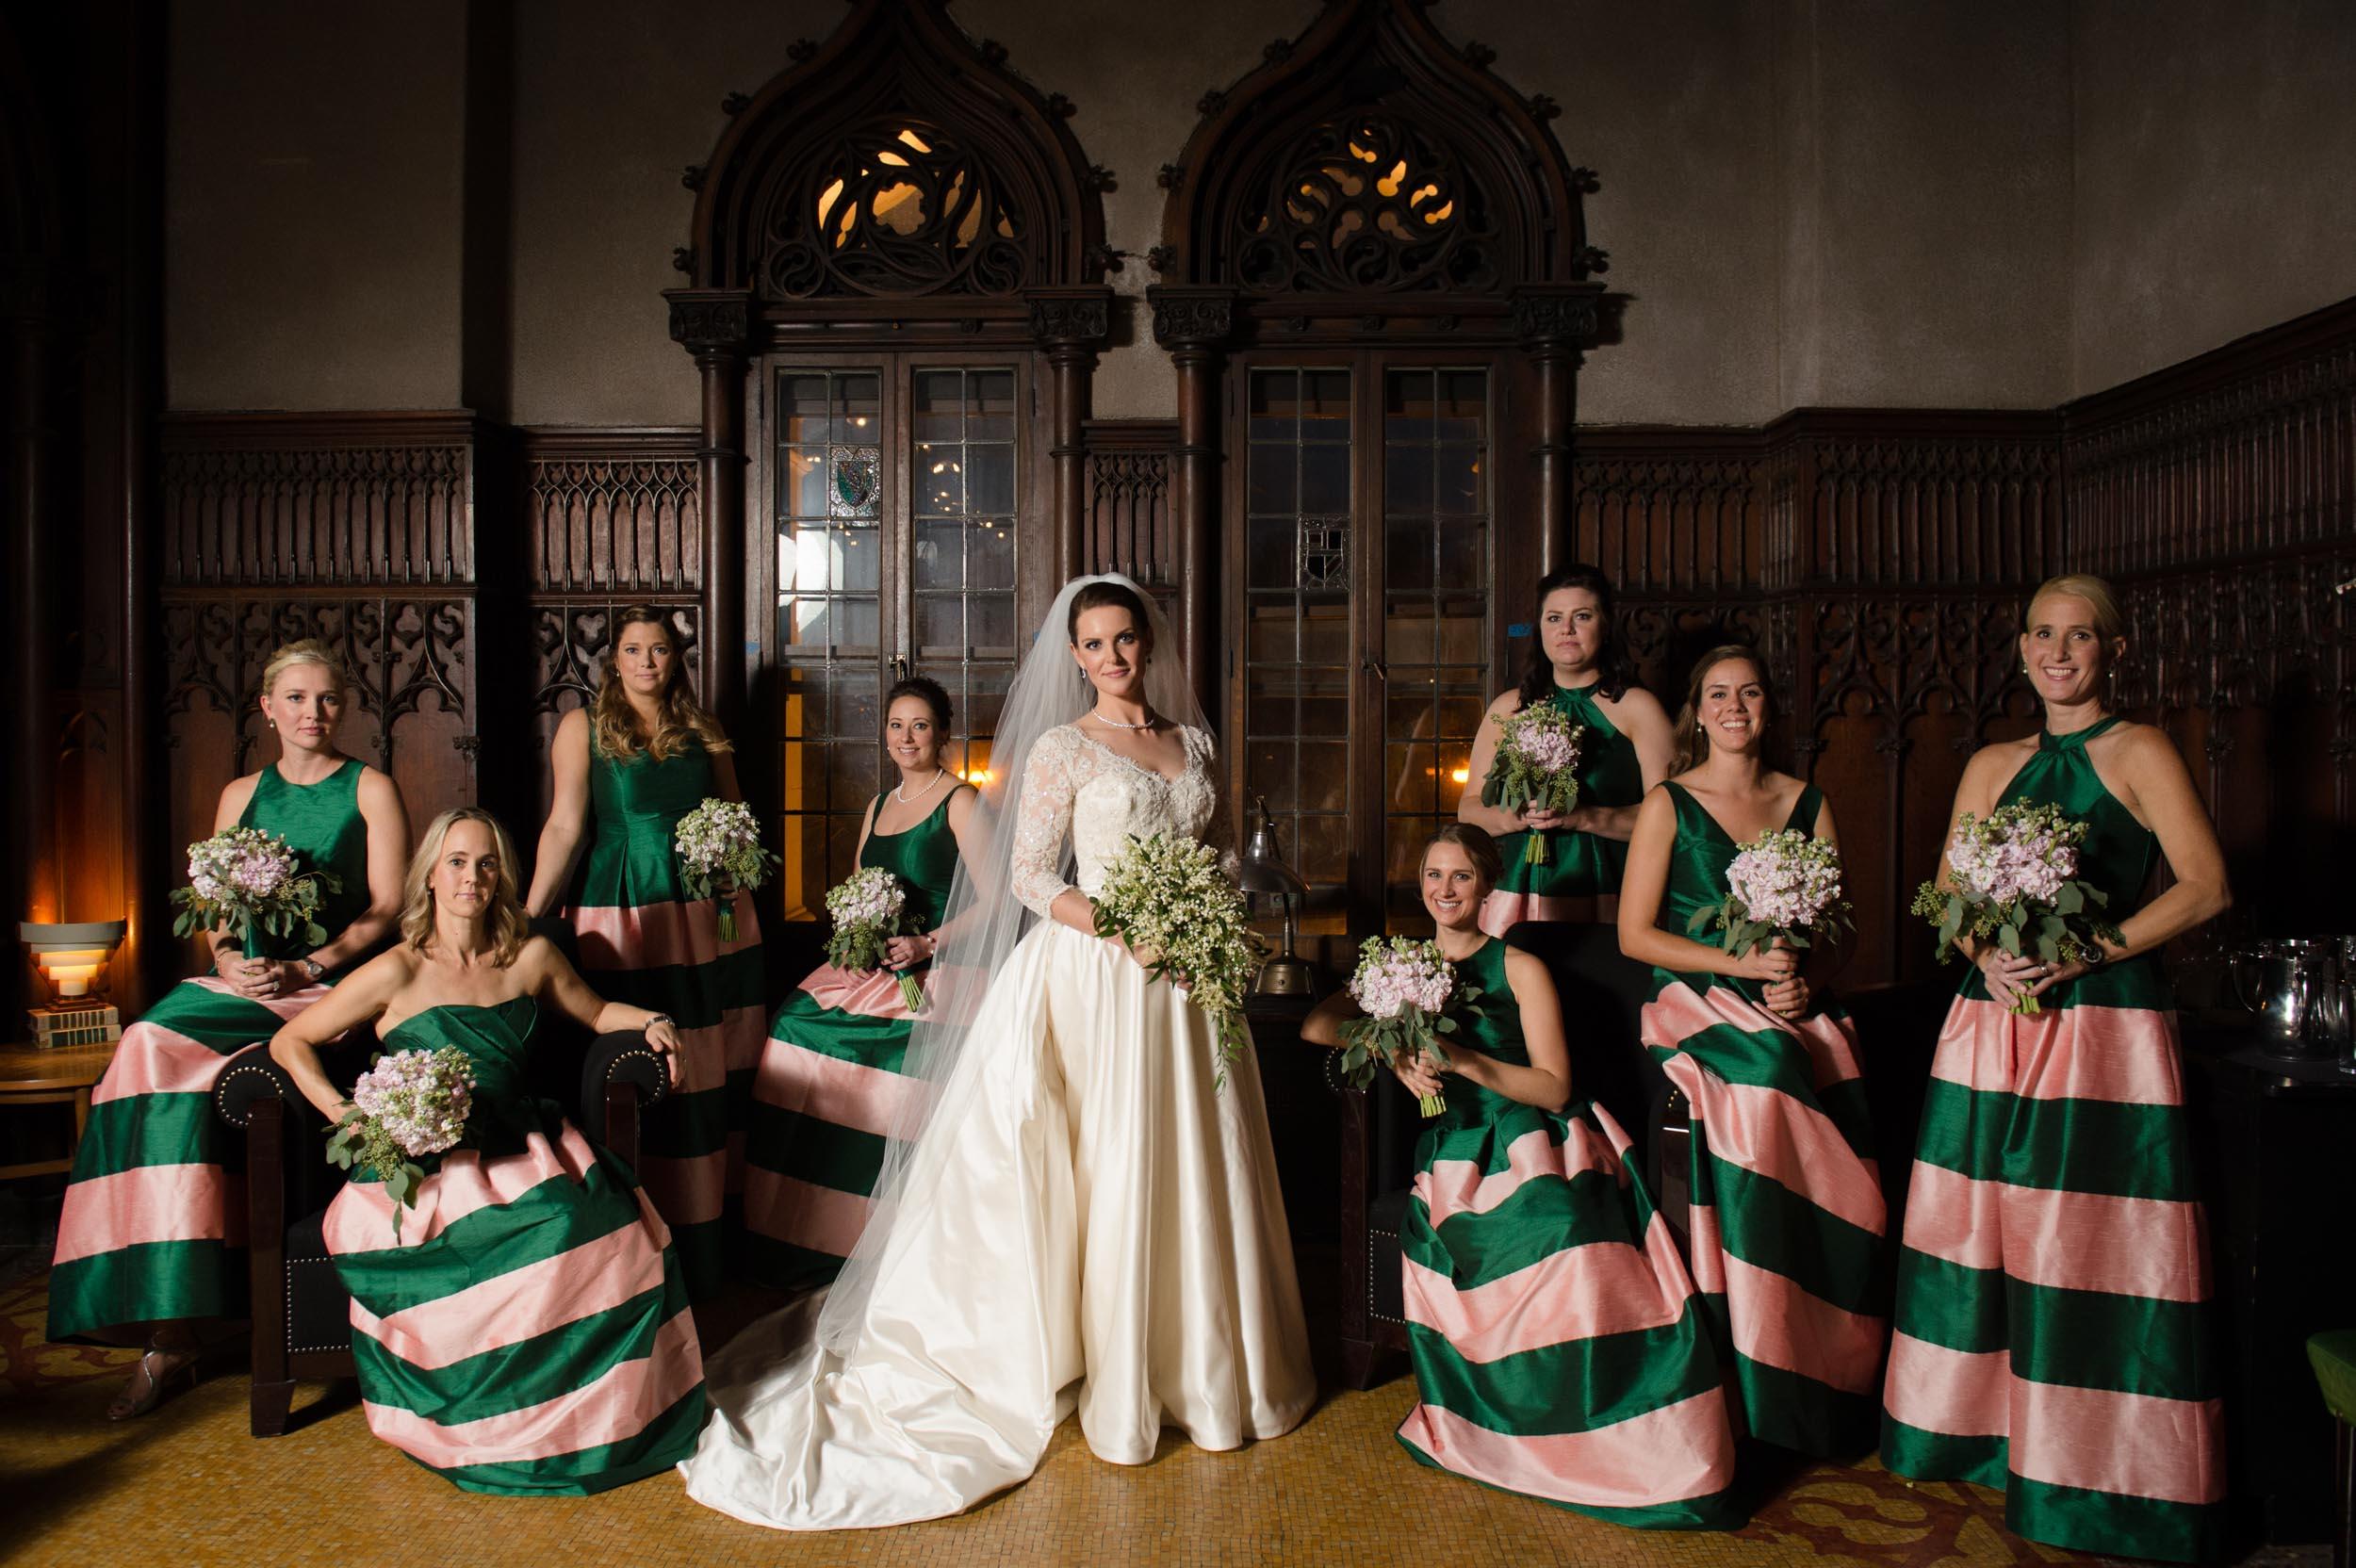 Bridal party portrait at Chicago Athletic Association Wedding